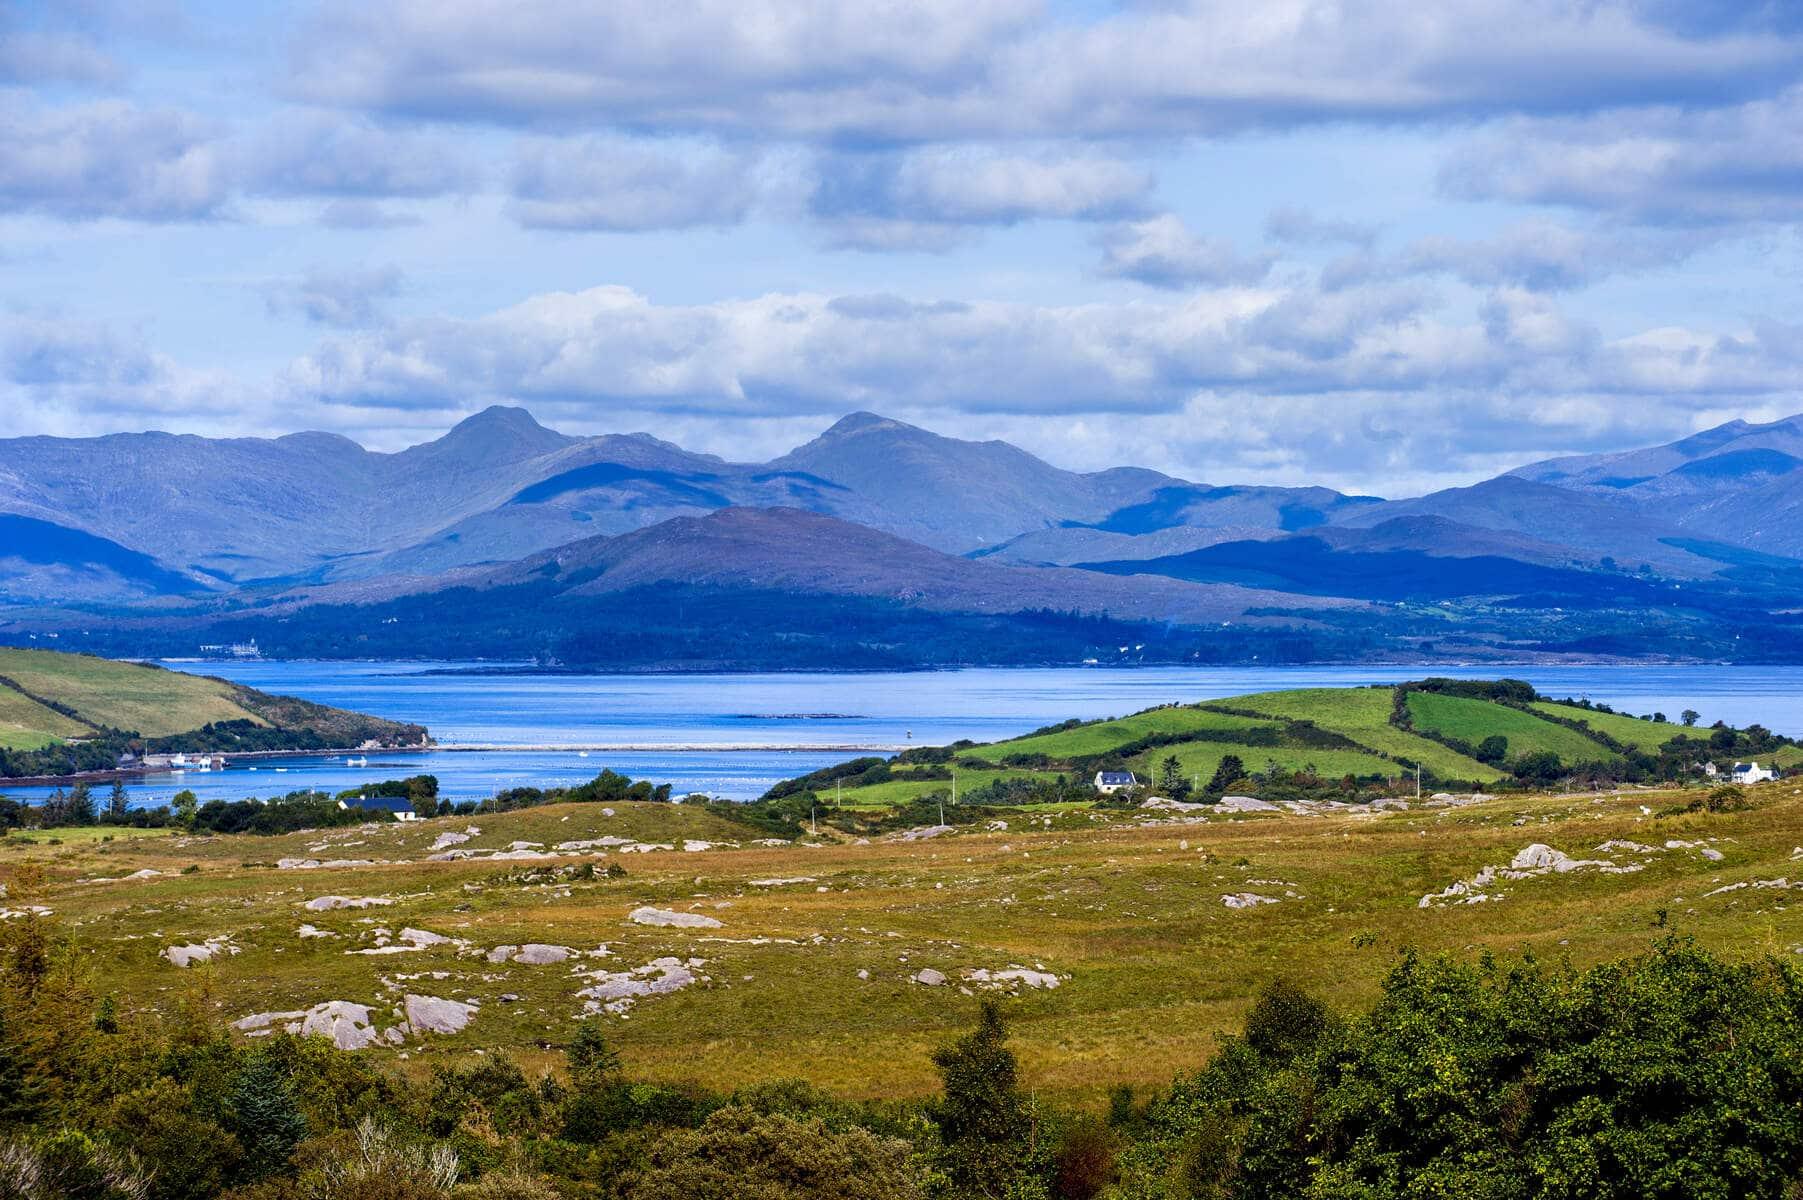 Macgillycuddys Reeks | Ireland's Content Pool